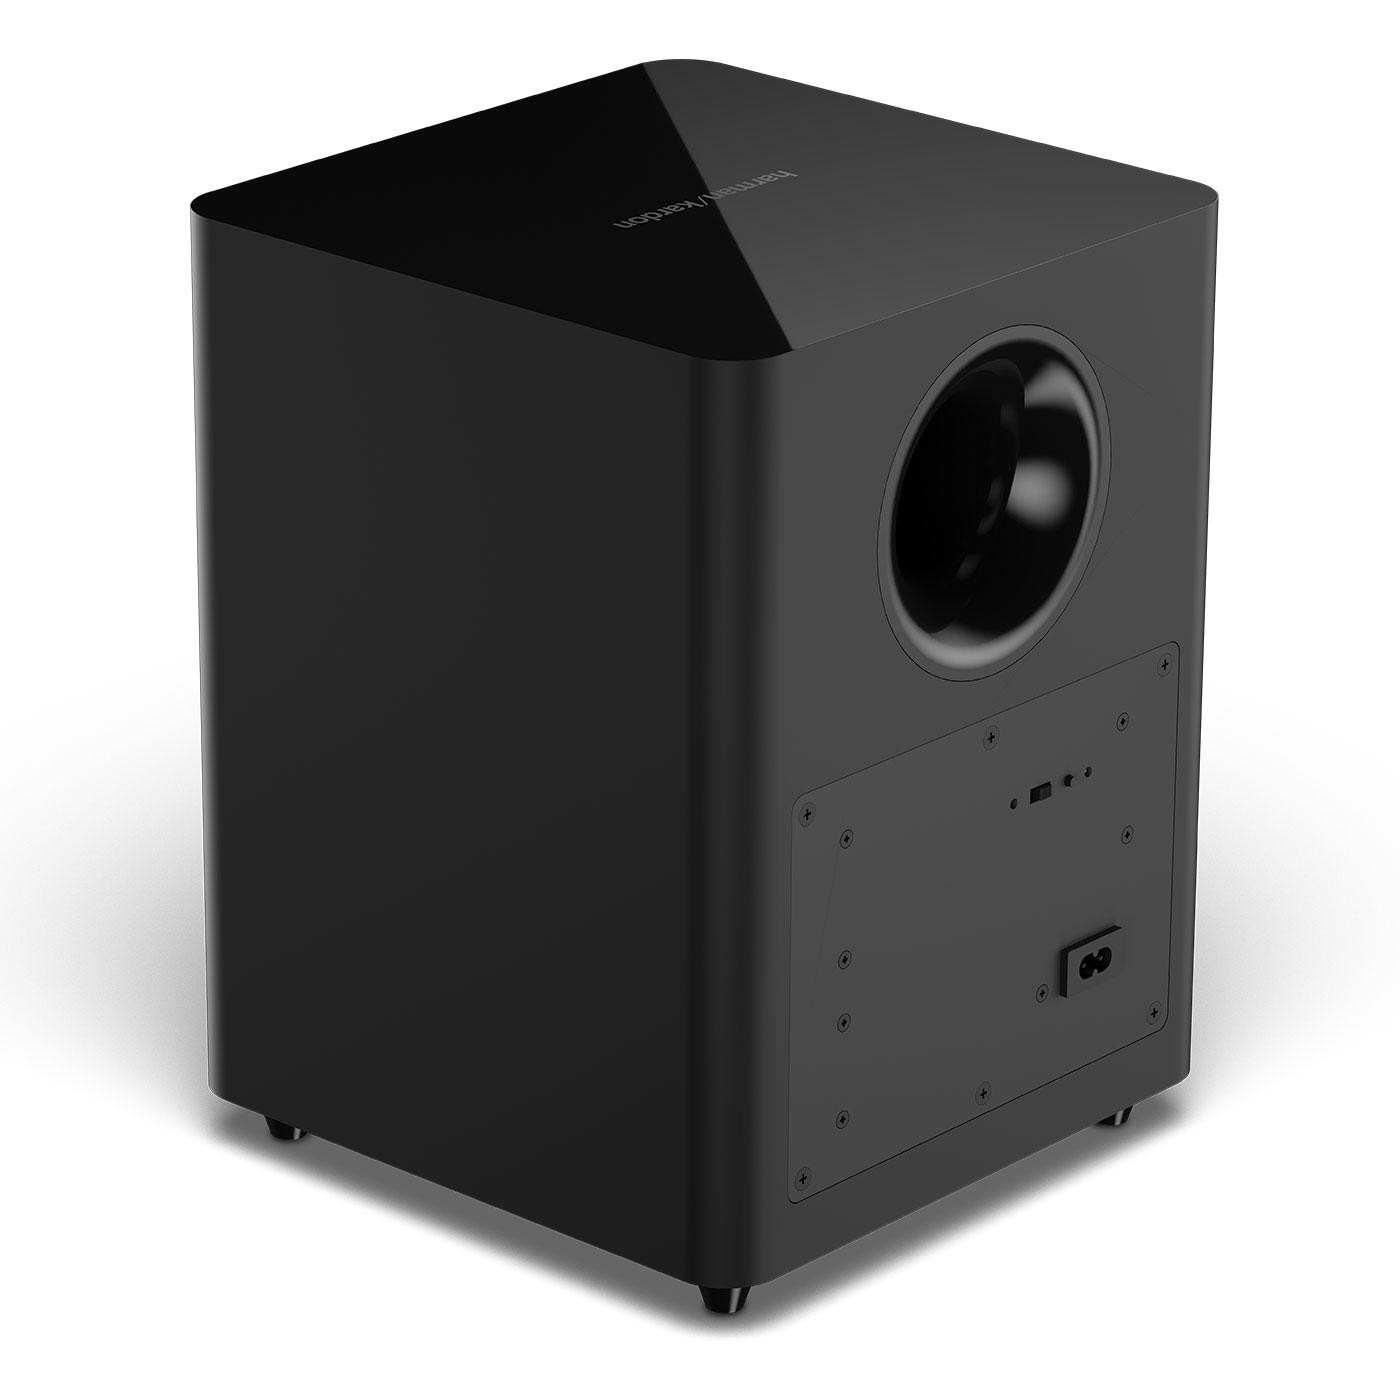 harman kardon sb 20 barre de son 2 1 bluetooth et hdmi avec caisson de basses sans fil. Black Bedroom Furniture Sets. Home Design Ideas